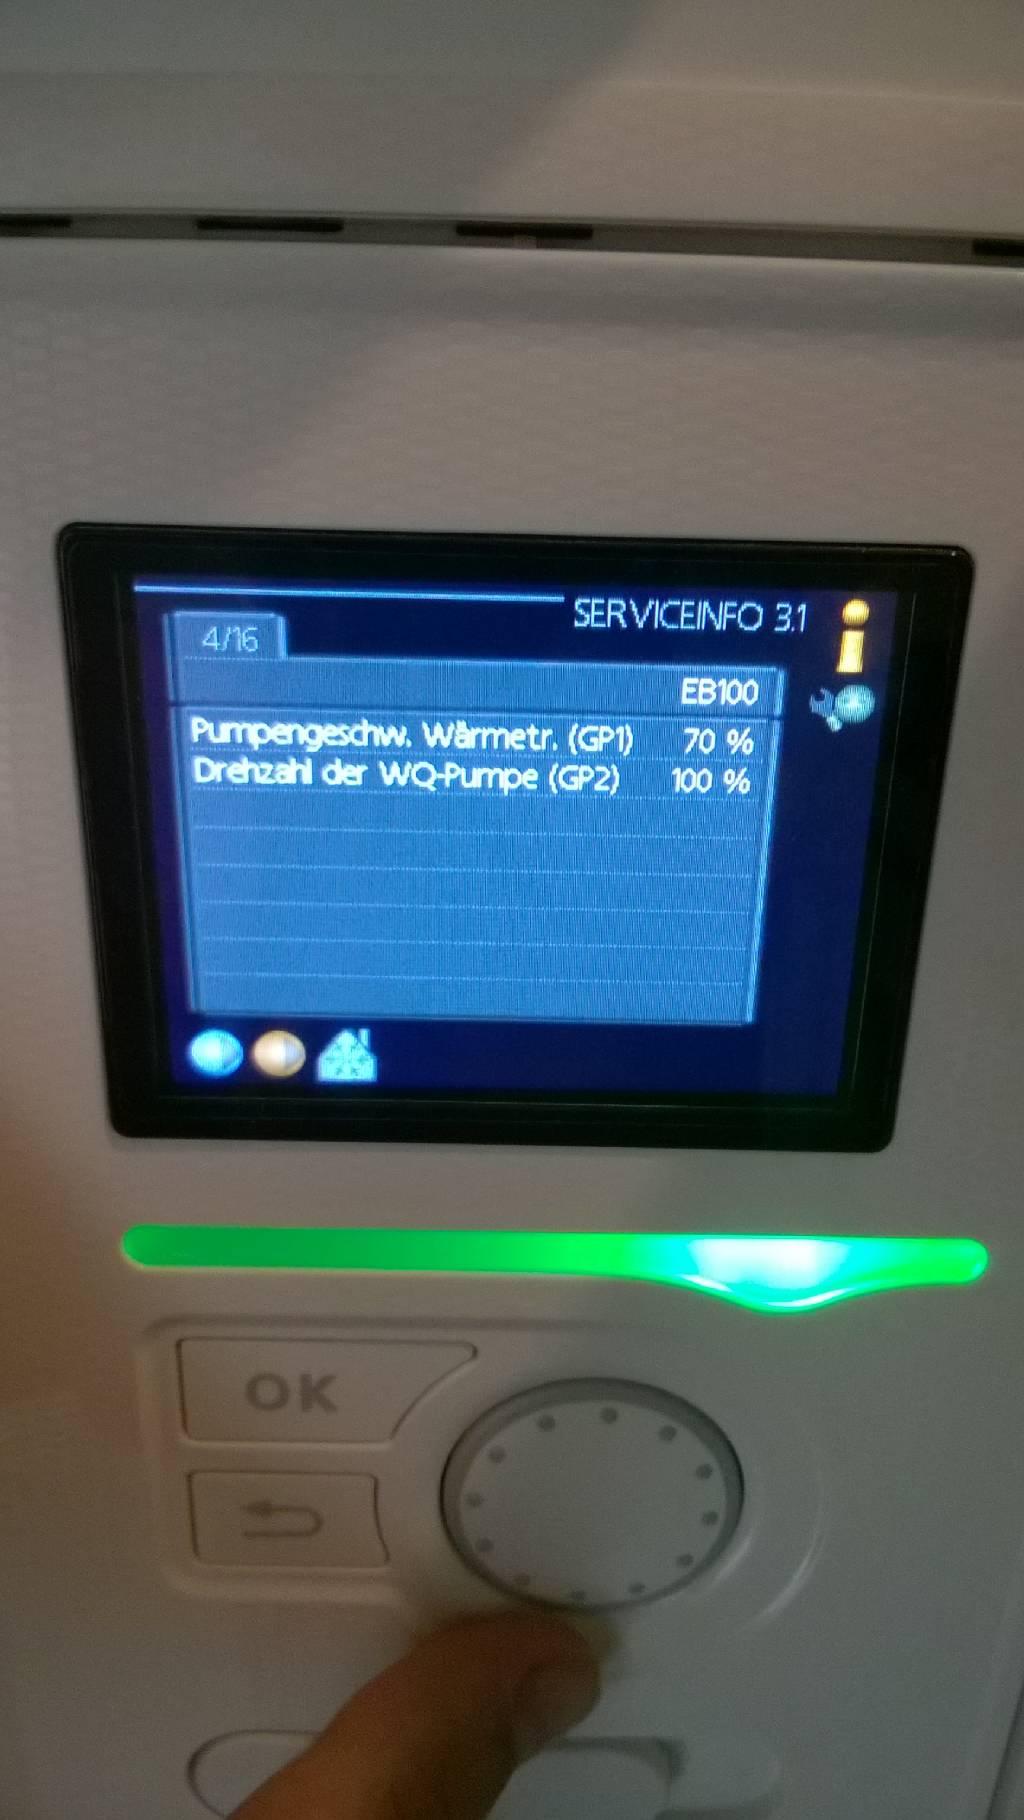 http://www.energiesparhaus.at/bilderupload2016/20160628321346.JPG